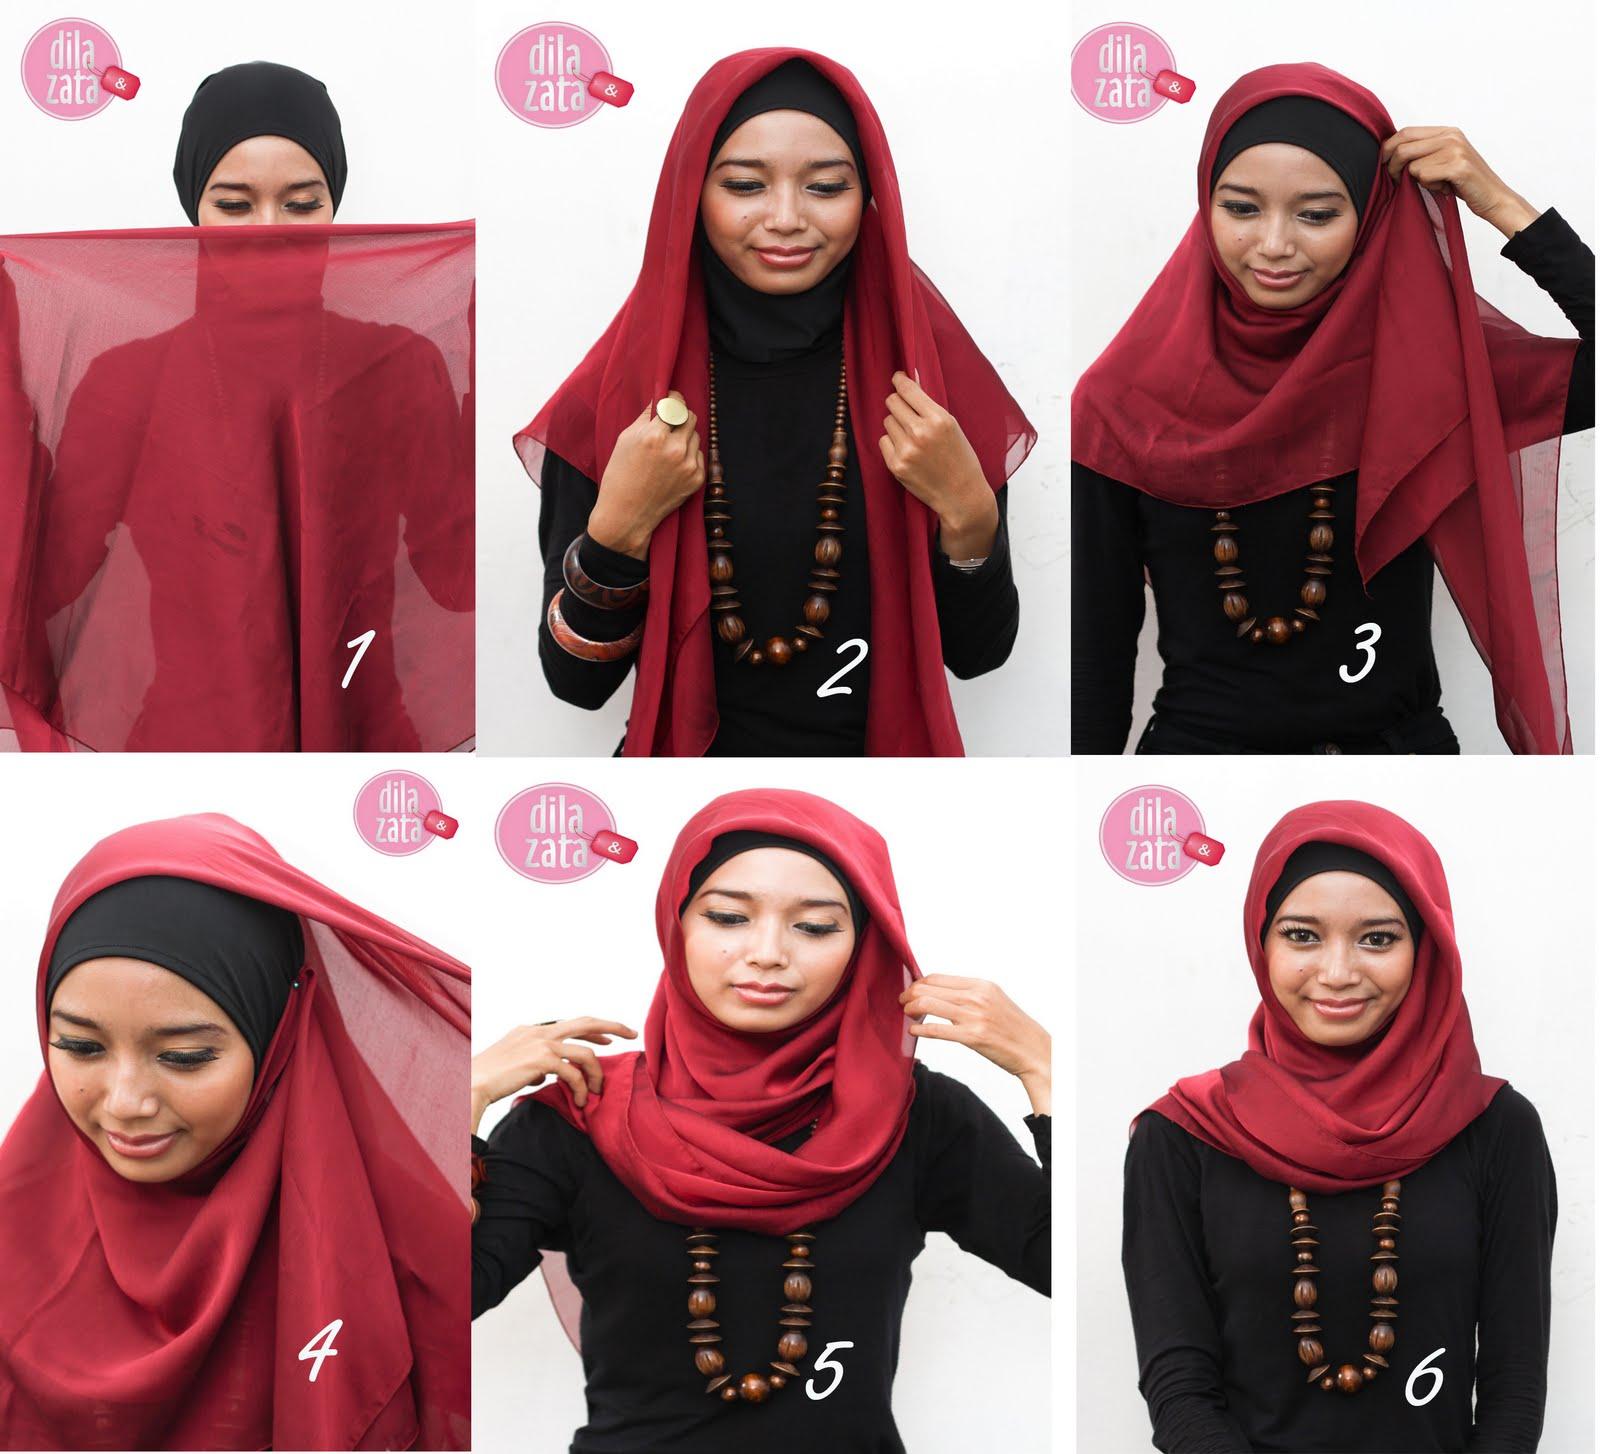 Httutorial Hijab Segitiga Tutorial Hijab Segi Empat Android Apps